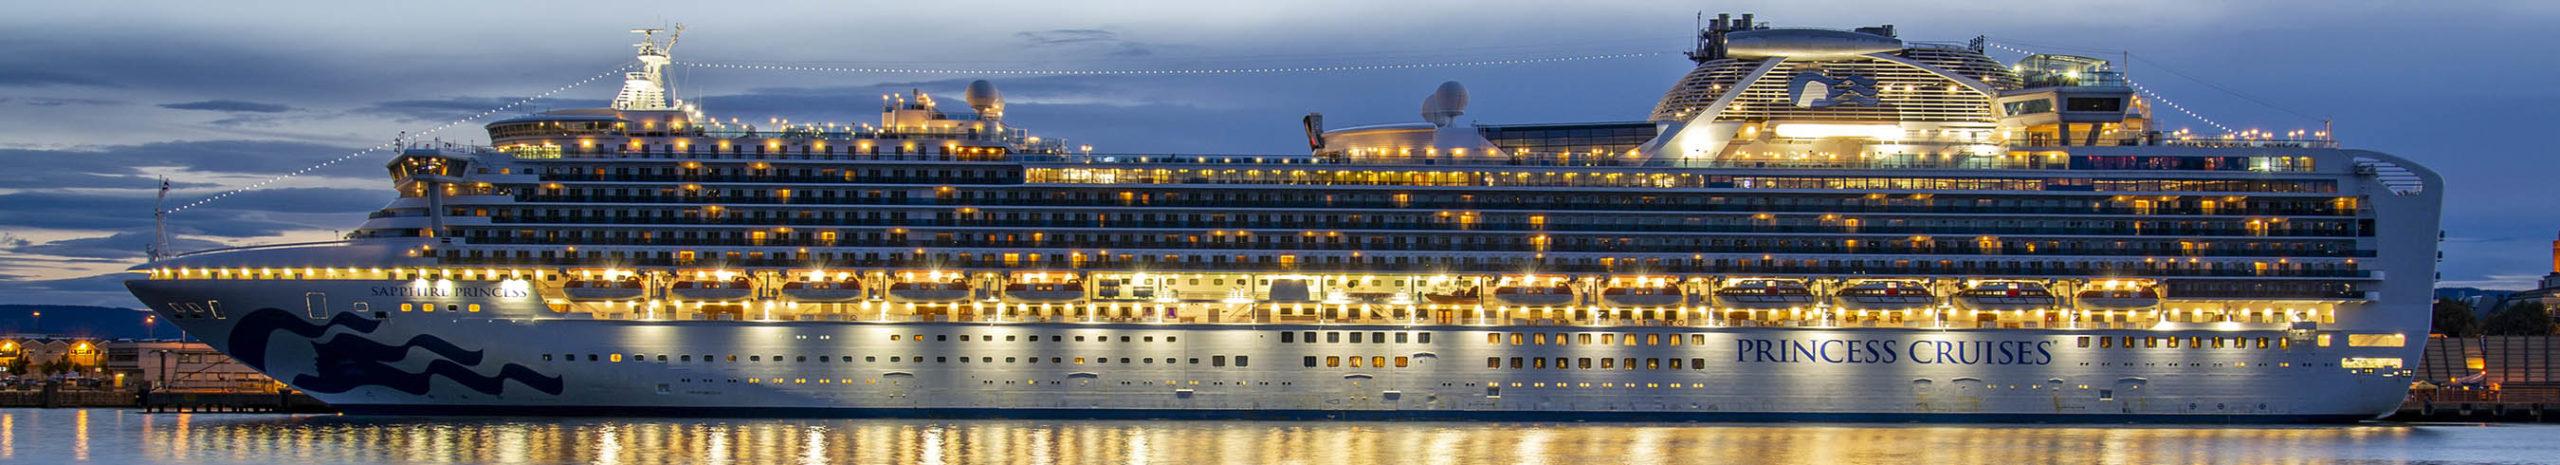 Индонезия и Юго-Восточная Азия <br> Sapphire Princess (Princess Cruises)